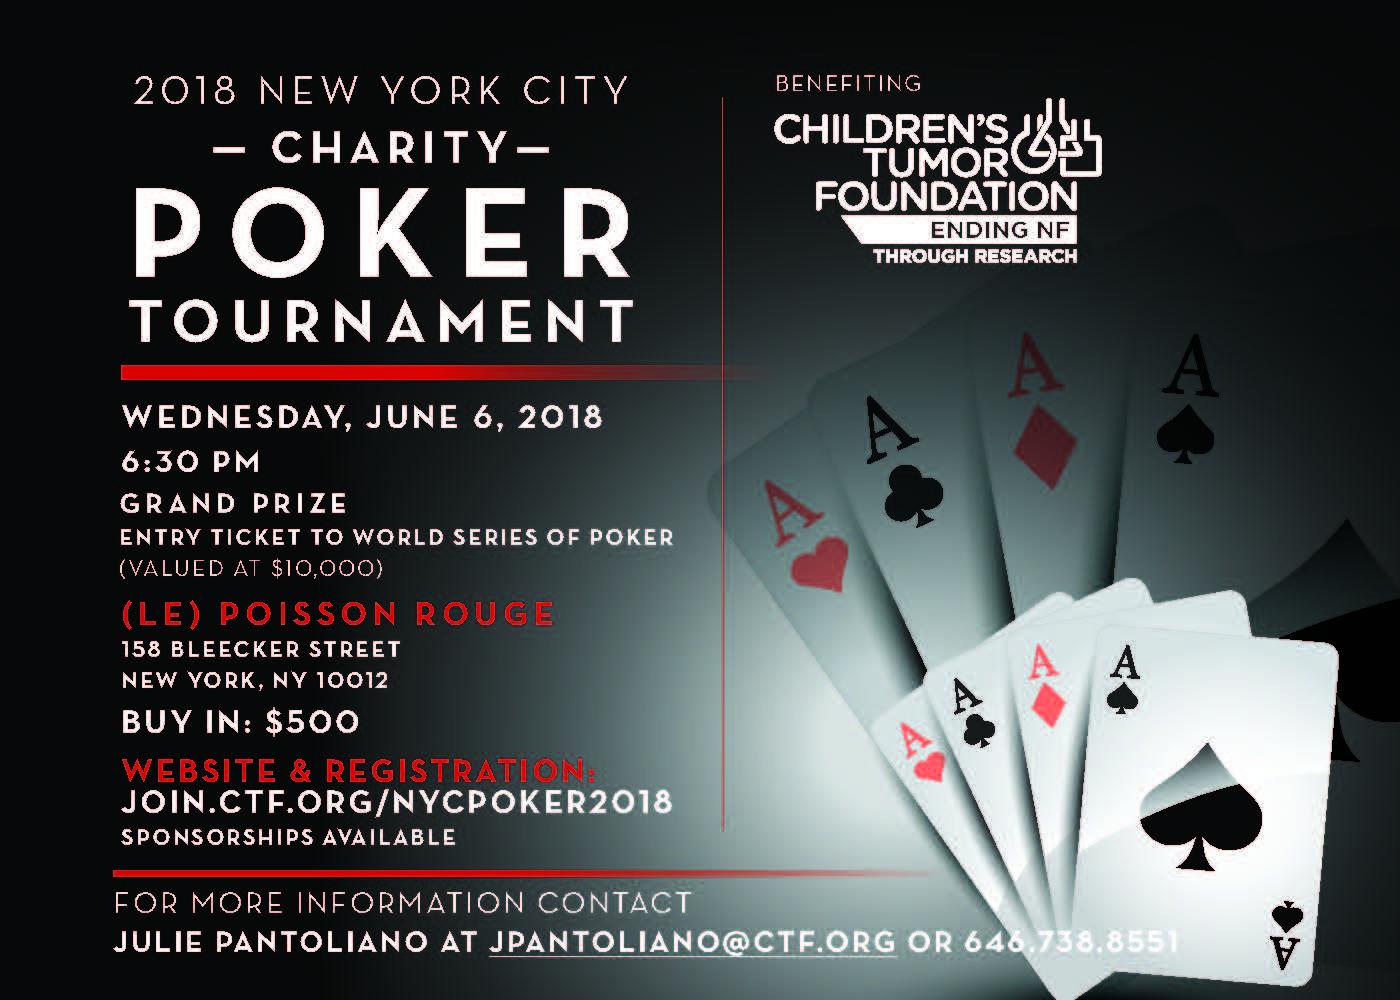 Nyc charity poker tournament buffalo gold slot machine download